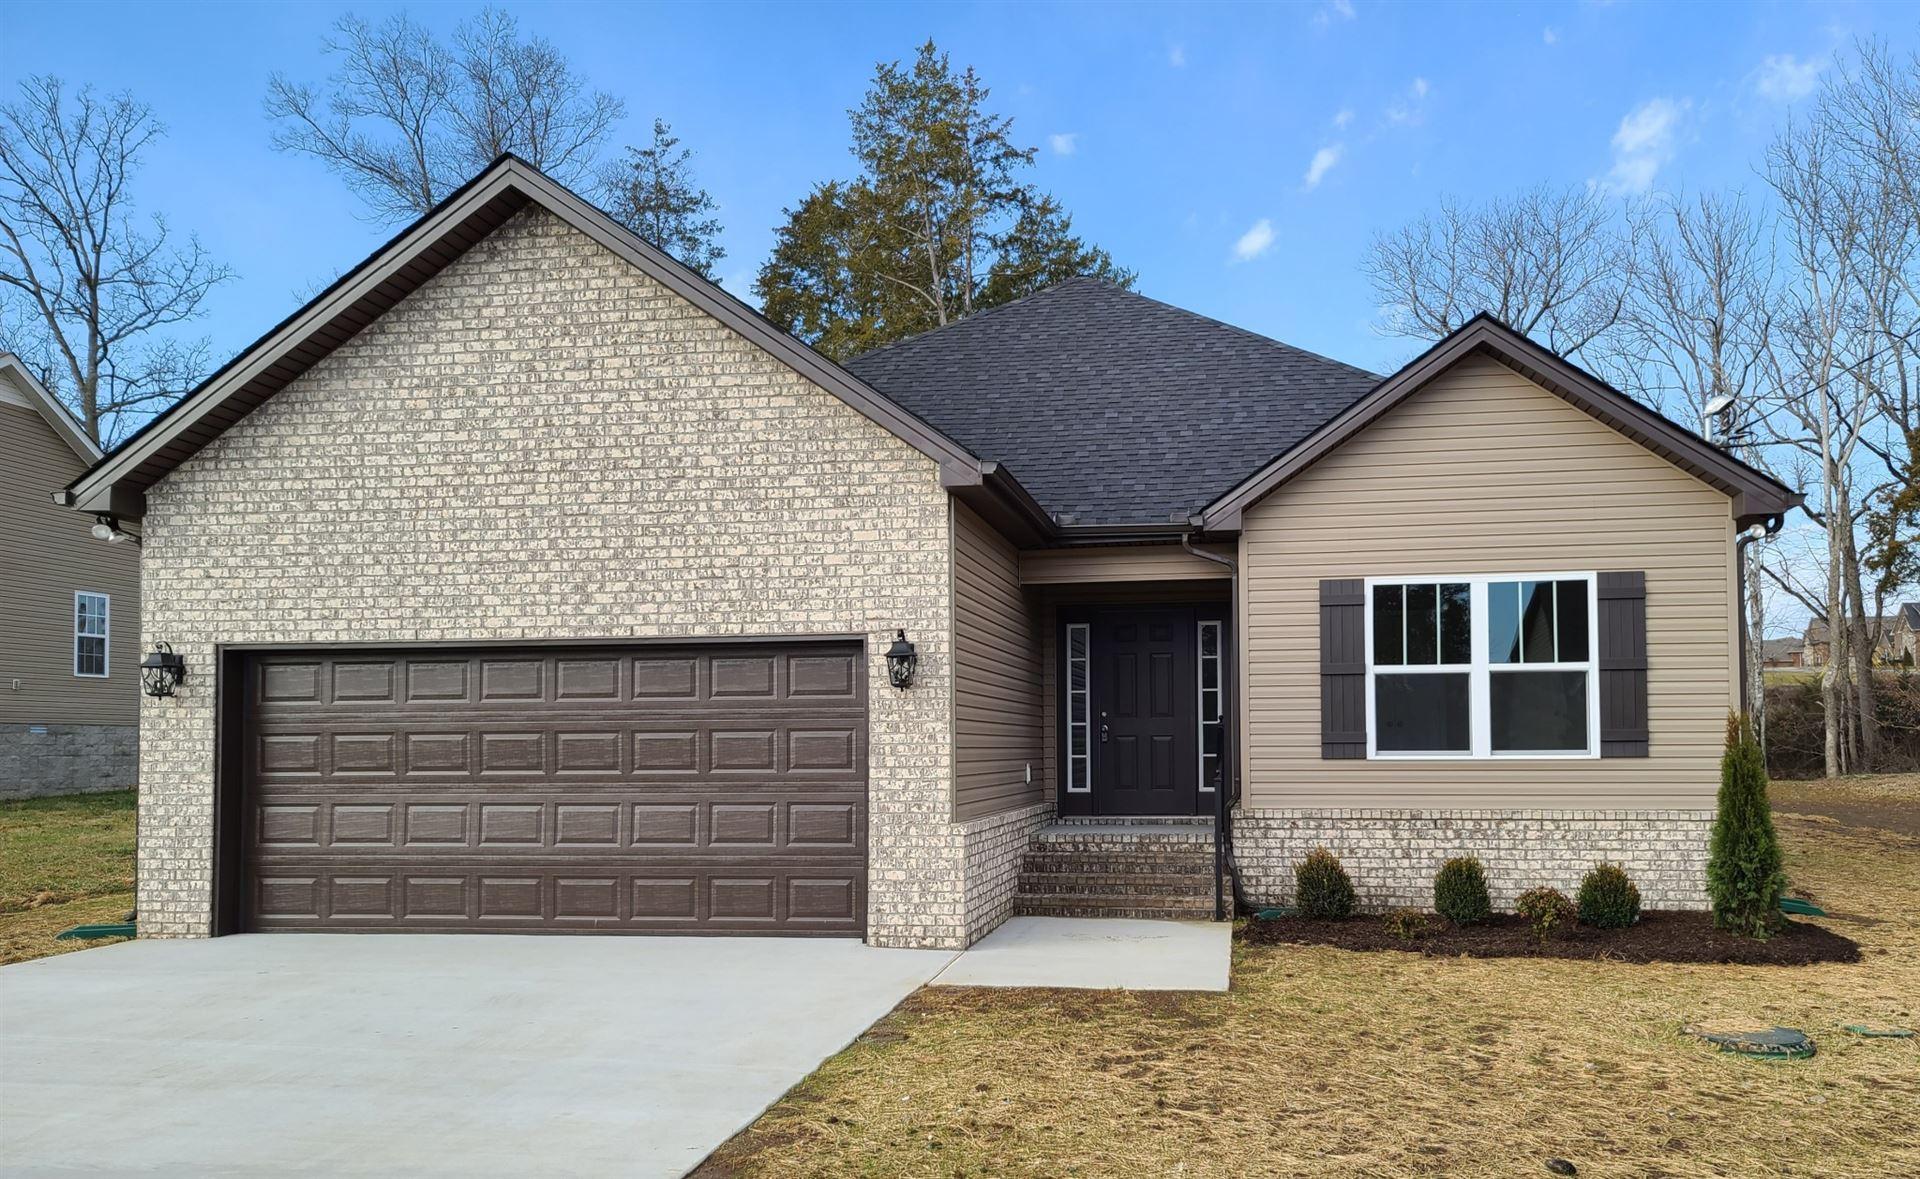 Photo of 207 Niagra Ln, Murfreesboro, TN 37129 (MLS # 2230270)